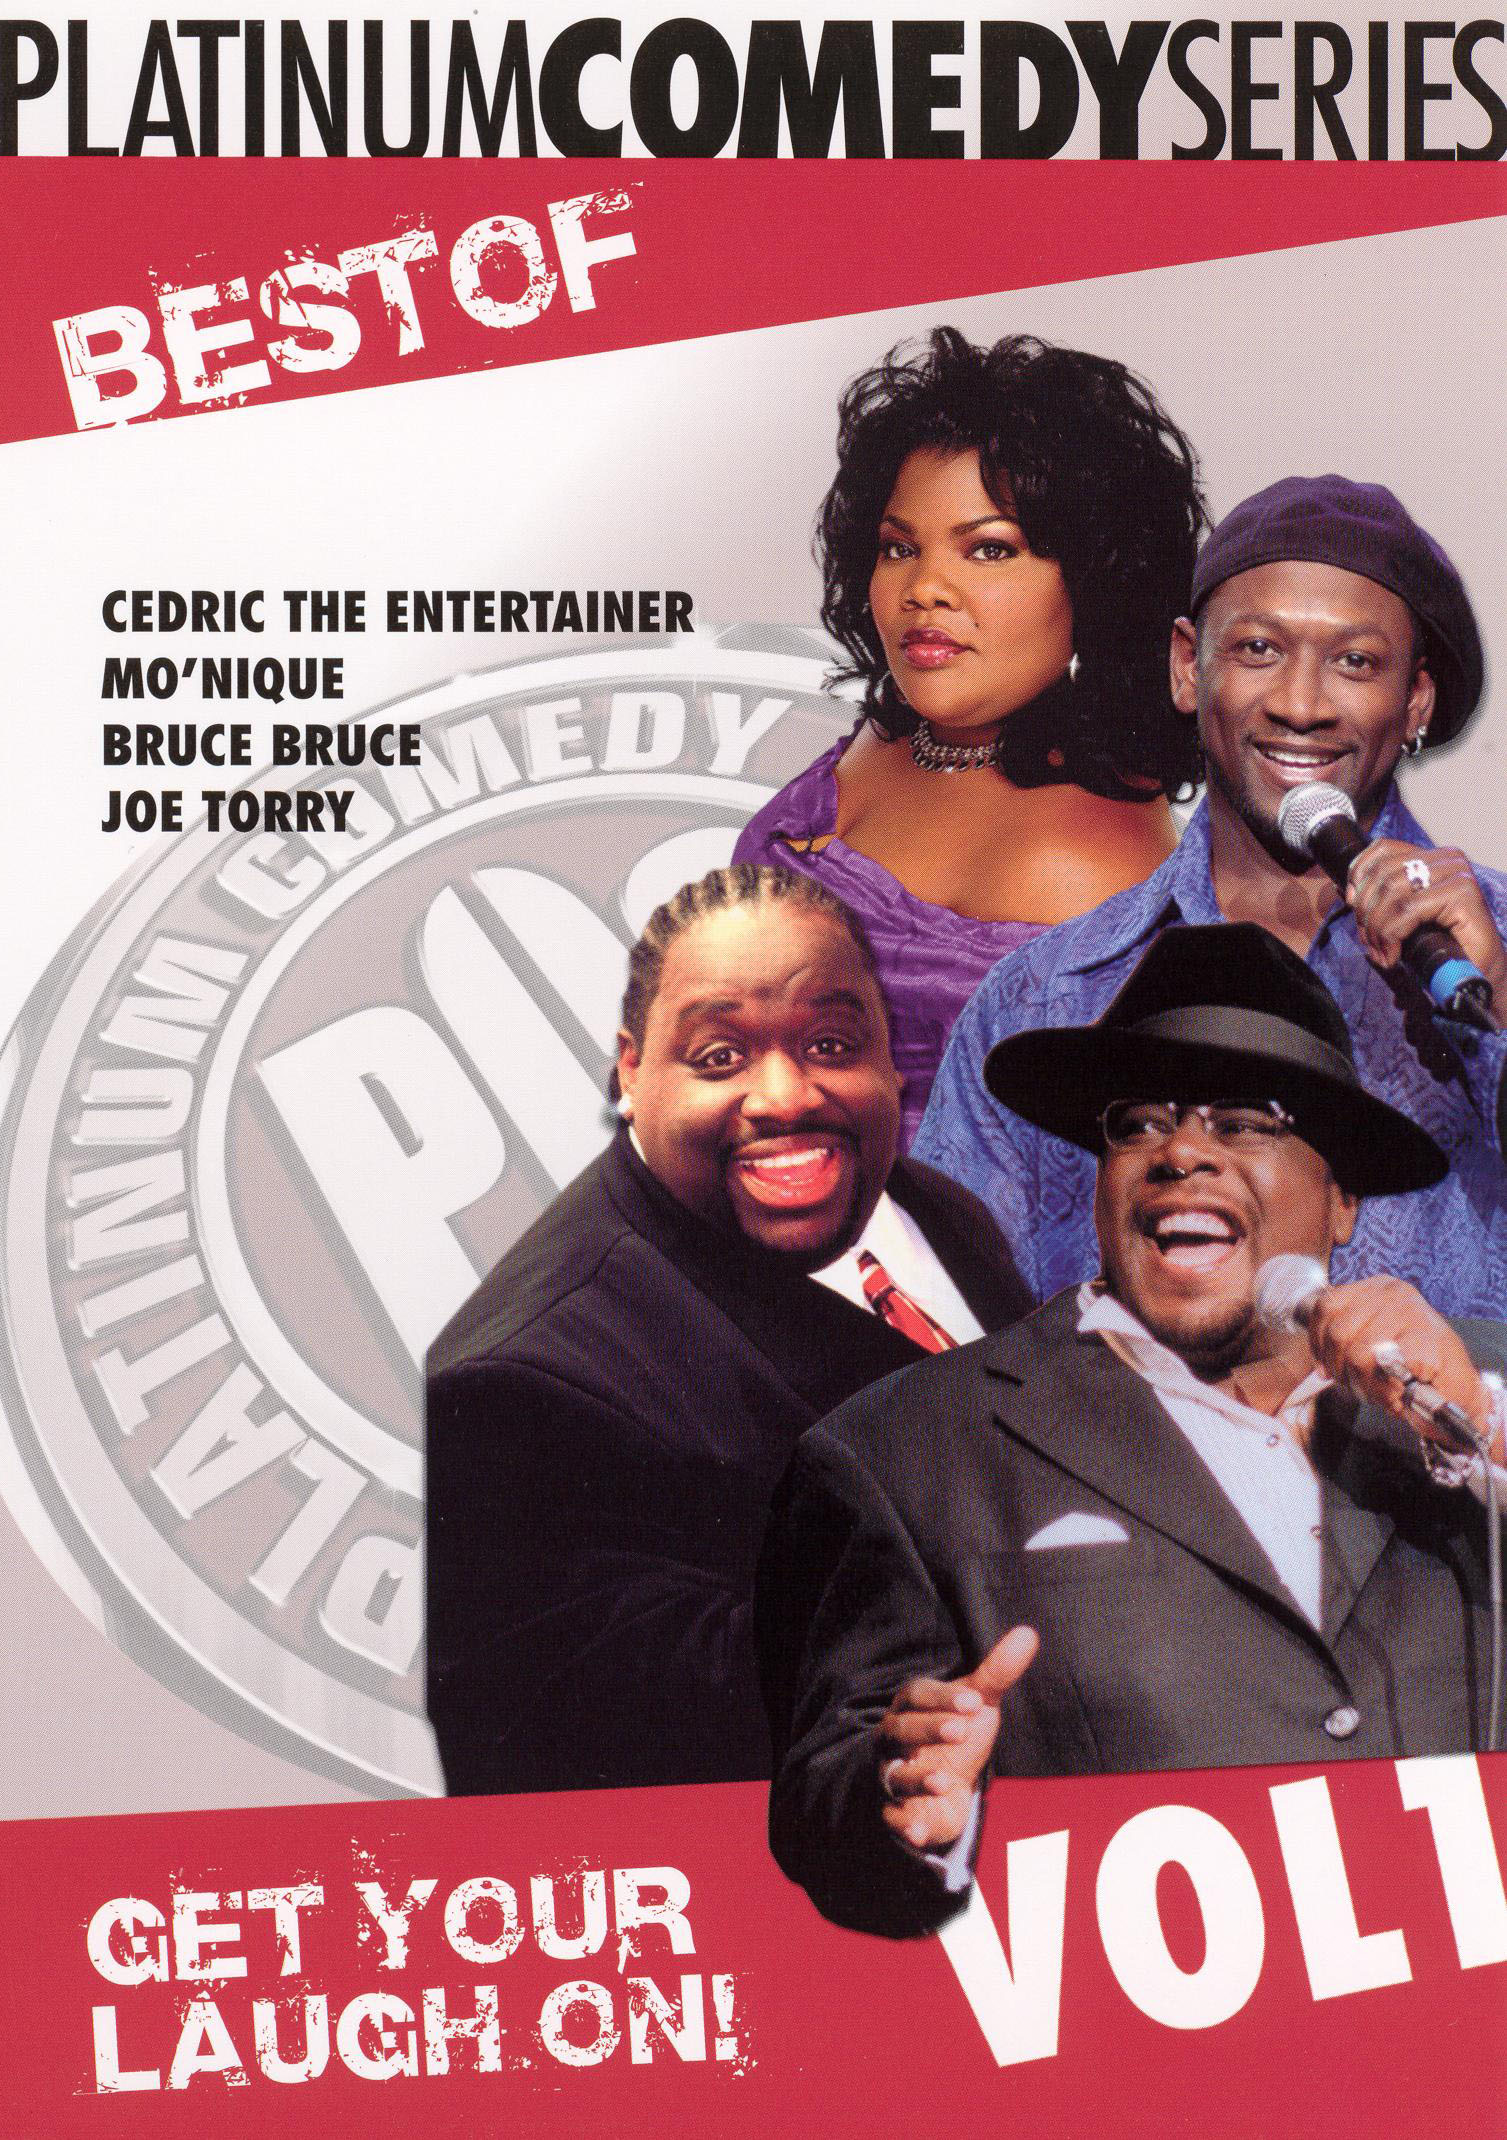 Platinum Comedy Series: Best of, Vol. 1